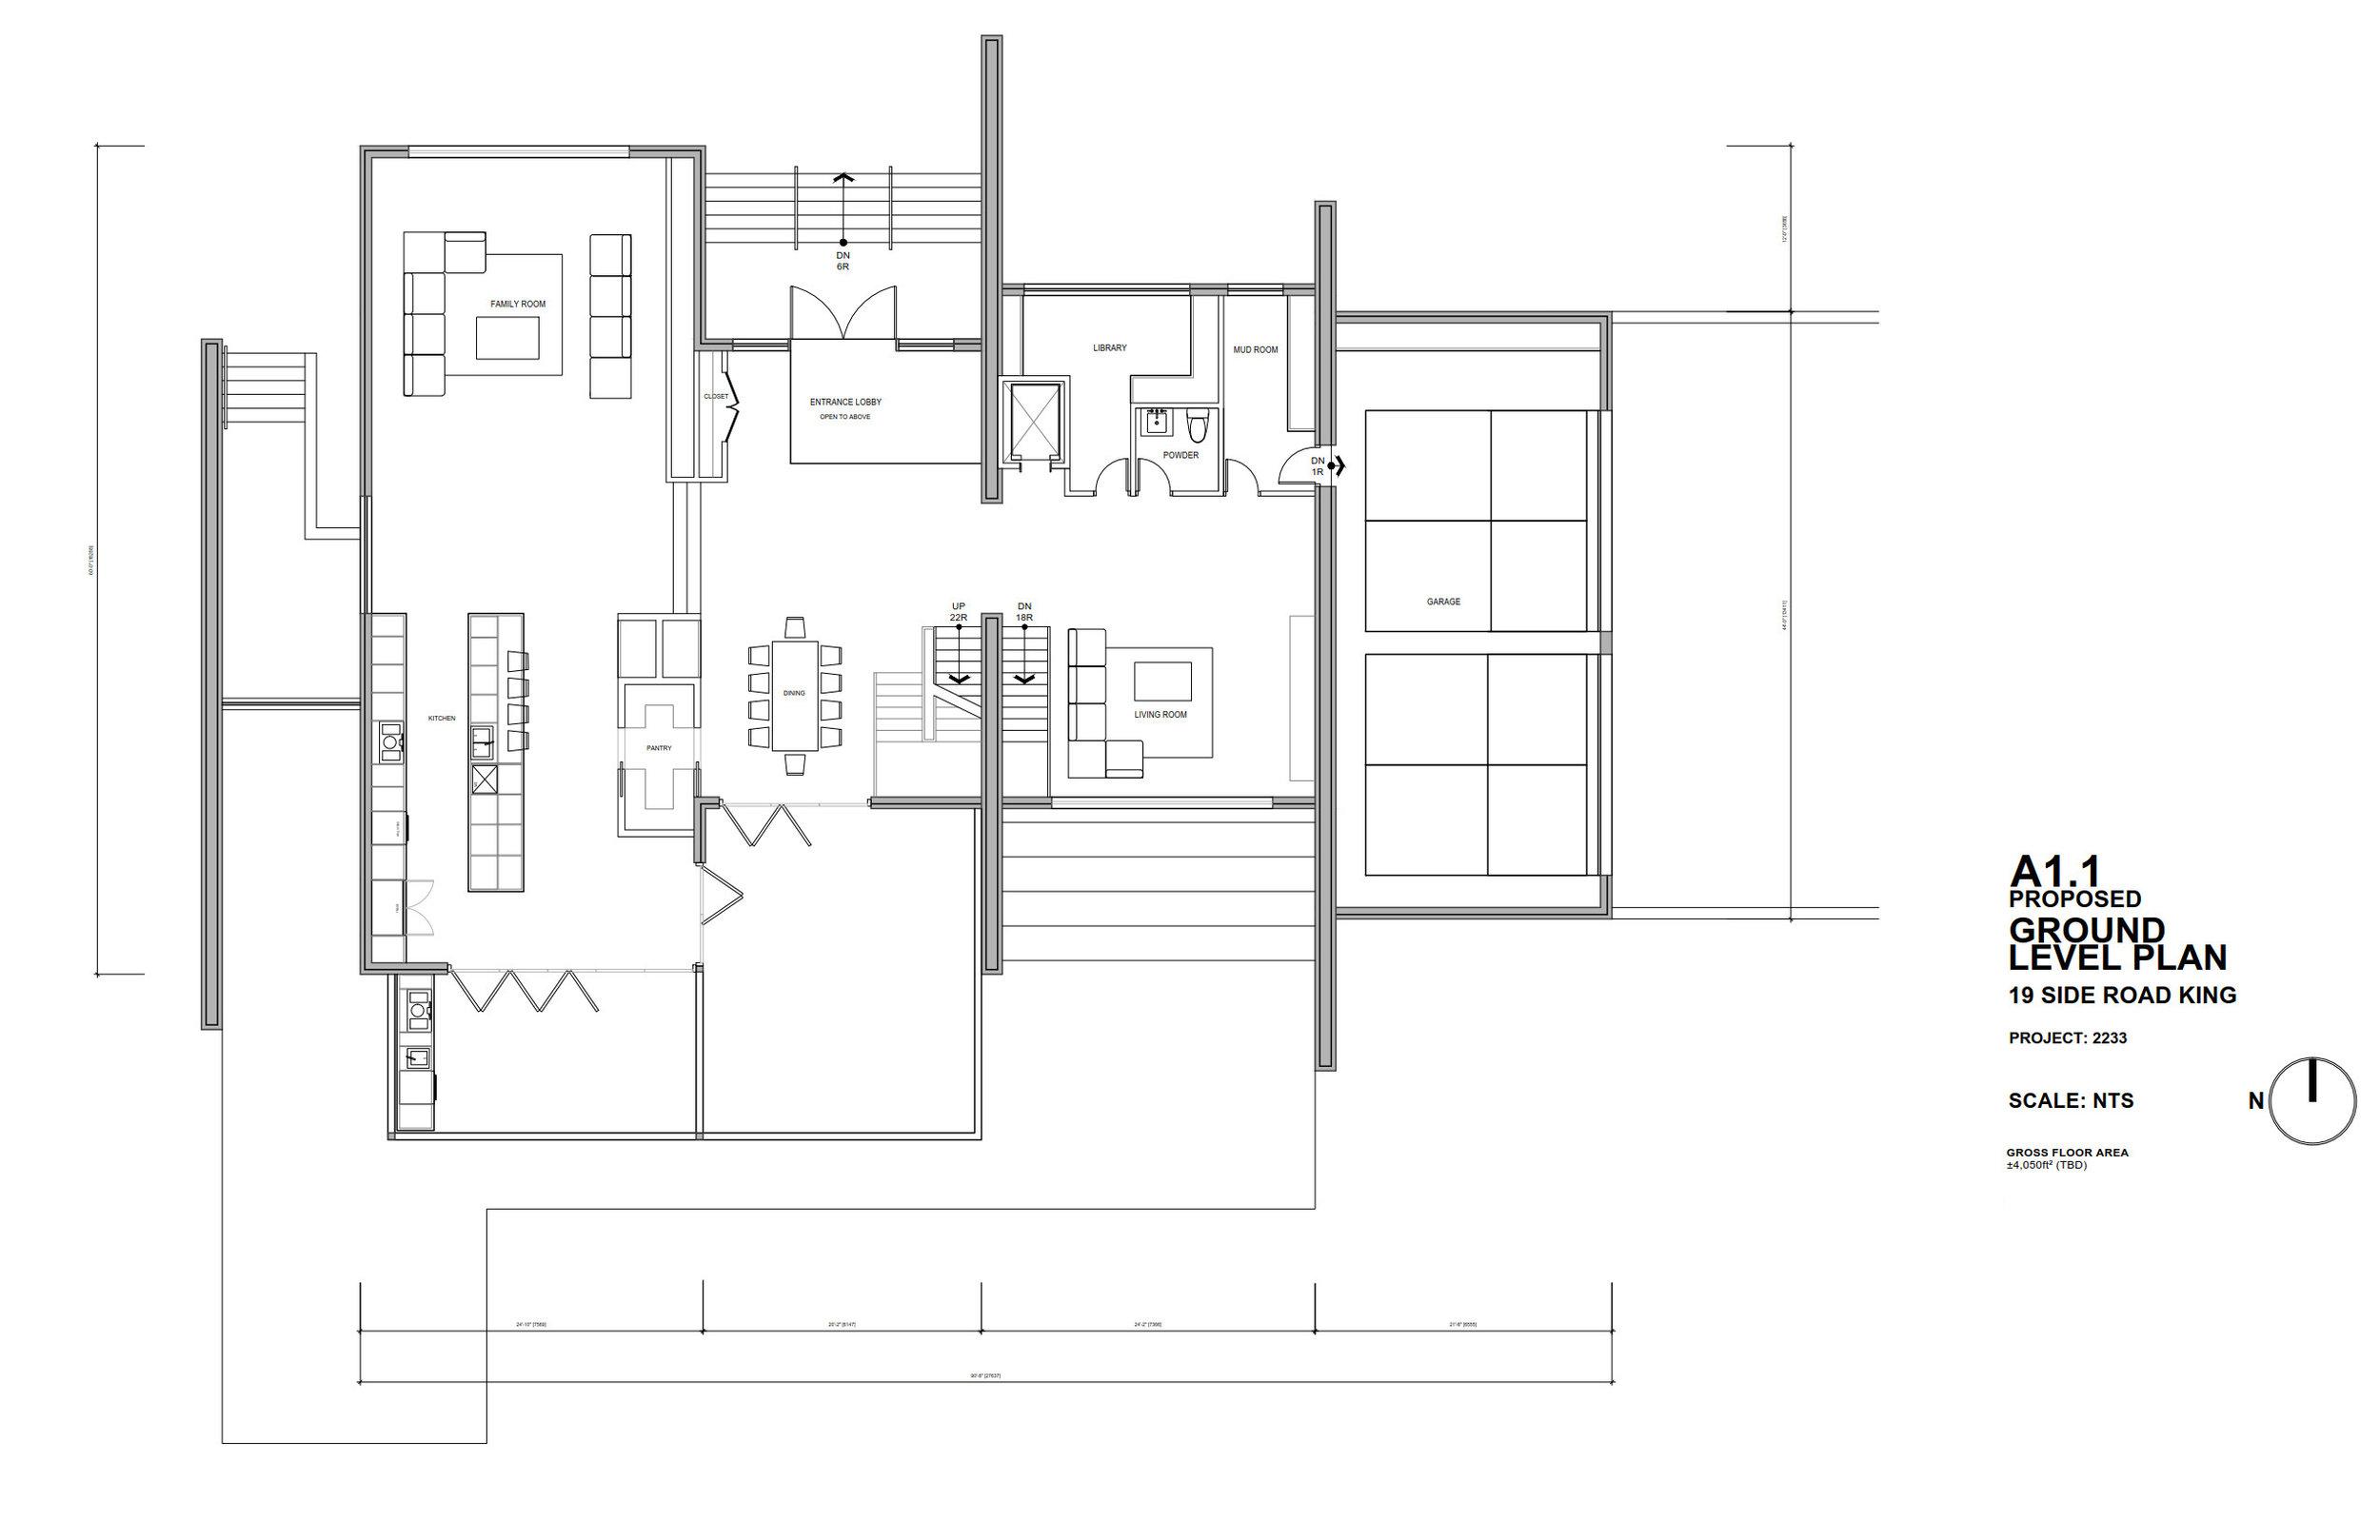 Drawing, Plan, Ground Floor